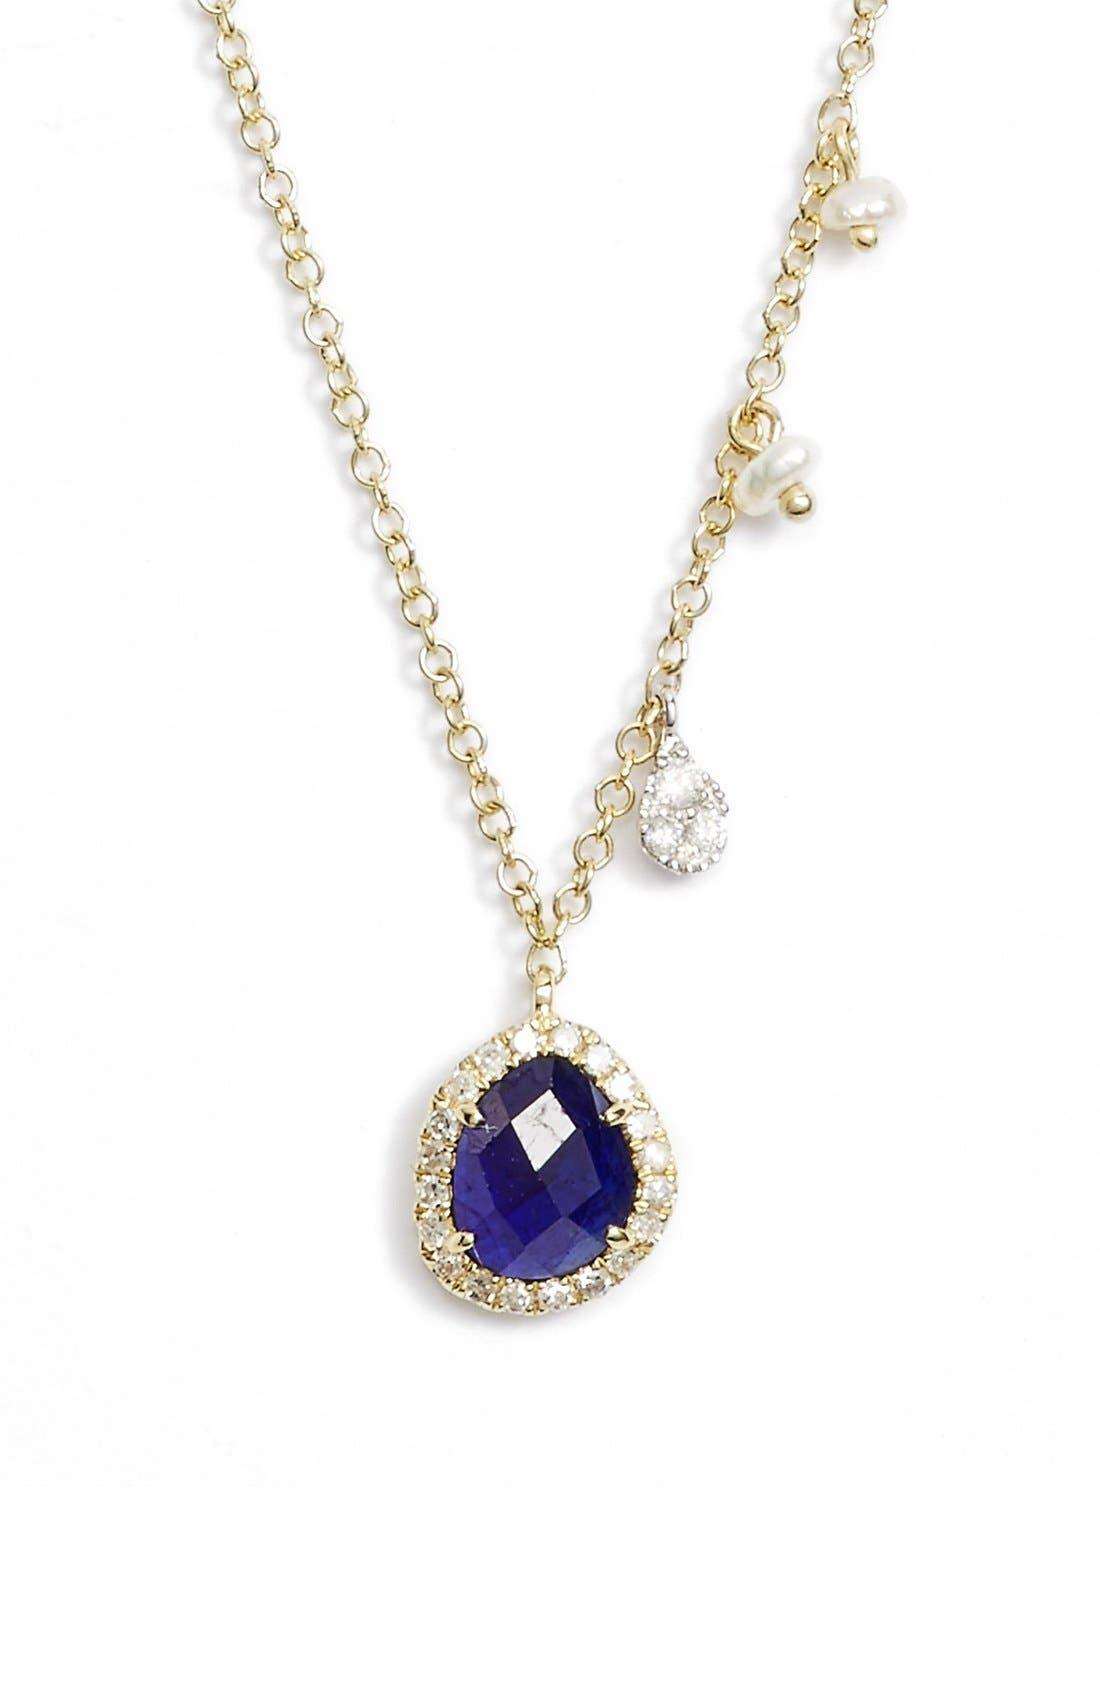 Mini Stone Diamond Pendant Necklace,                         Main,                         color, YELLOW GOLD/ BLUE SAPPHIRE